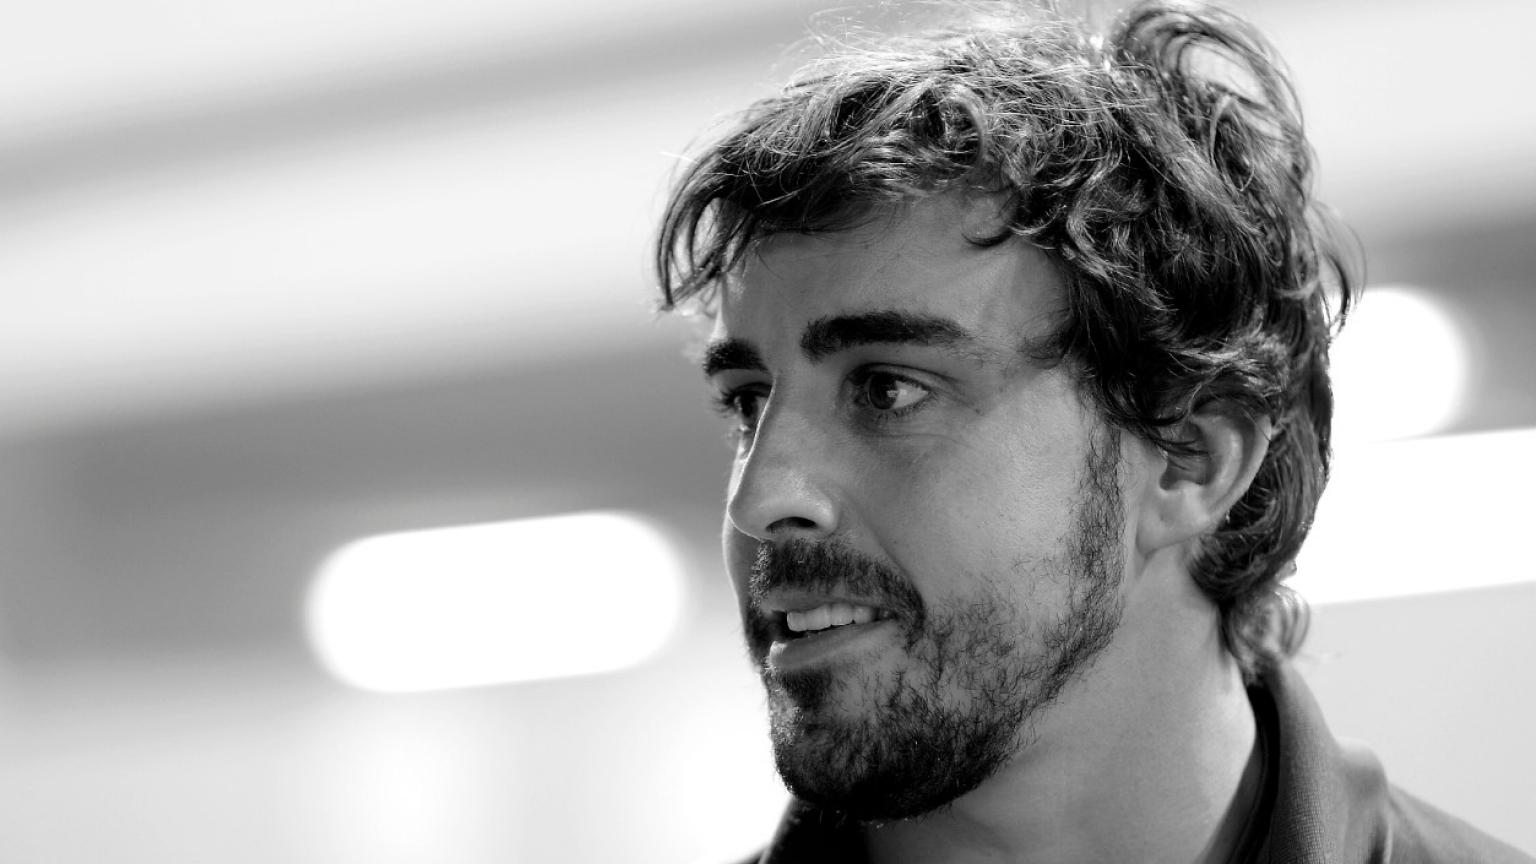 Fernando Alonso Backgrounds, Compatible - PC, Mobile, Gadgets| 1536x864 px